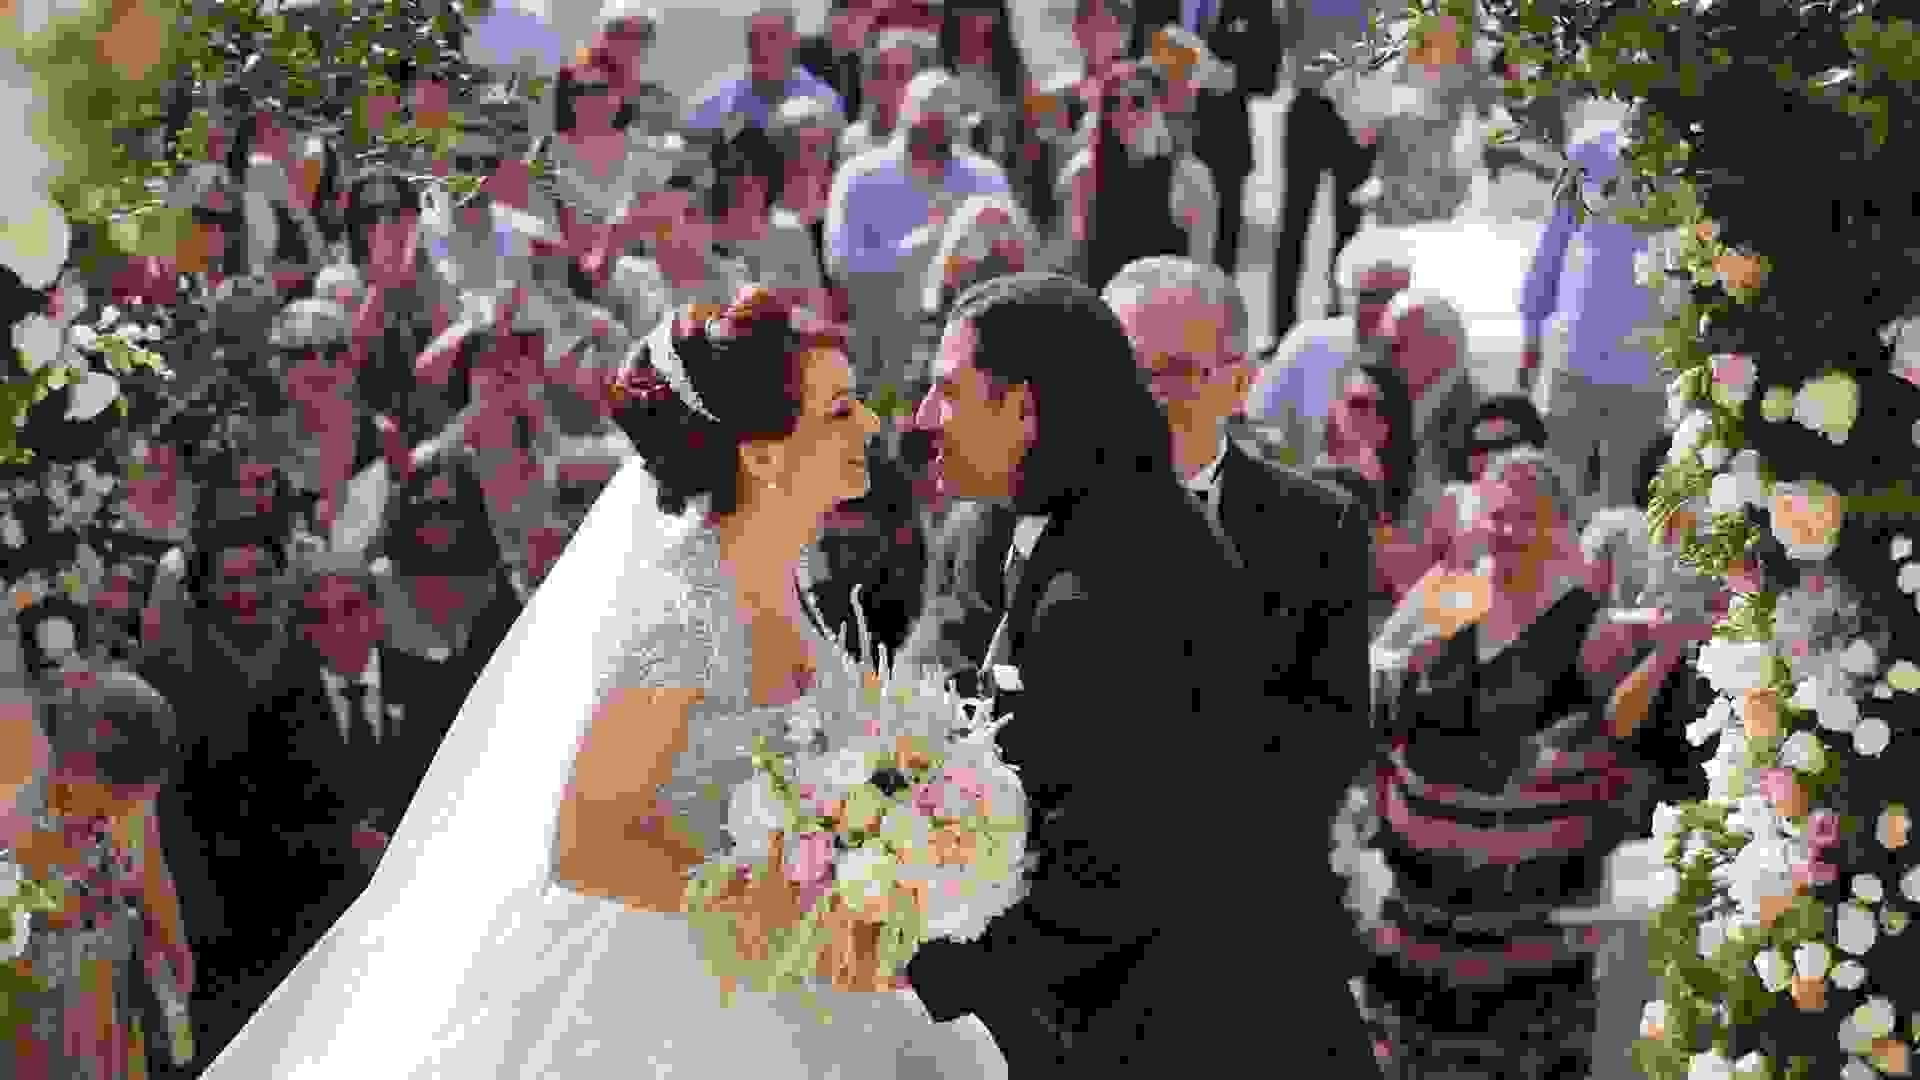 2e7d05a6a77 Μοντέρνος Glamorous Γάμος Βγαλμένος από Παραμύθι - Bride Diaries